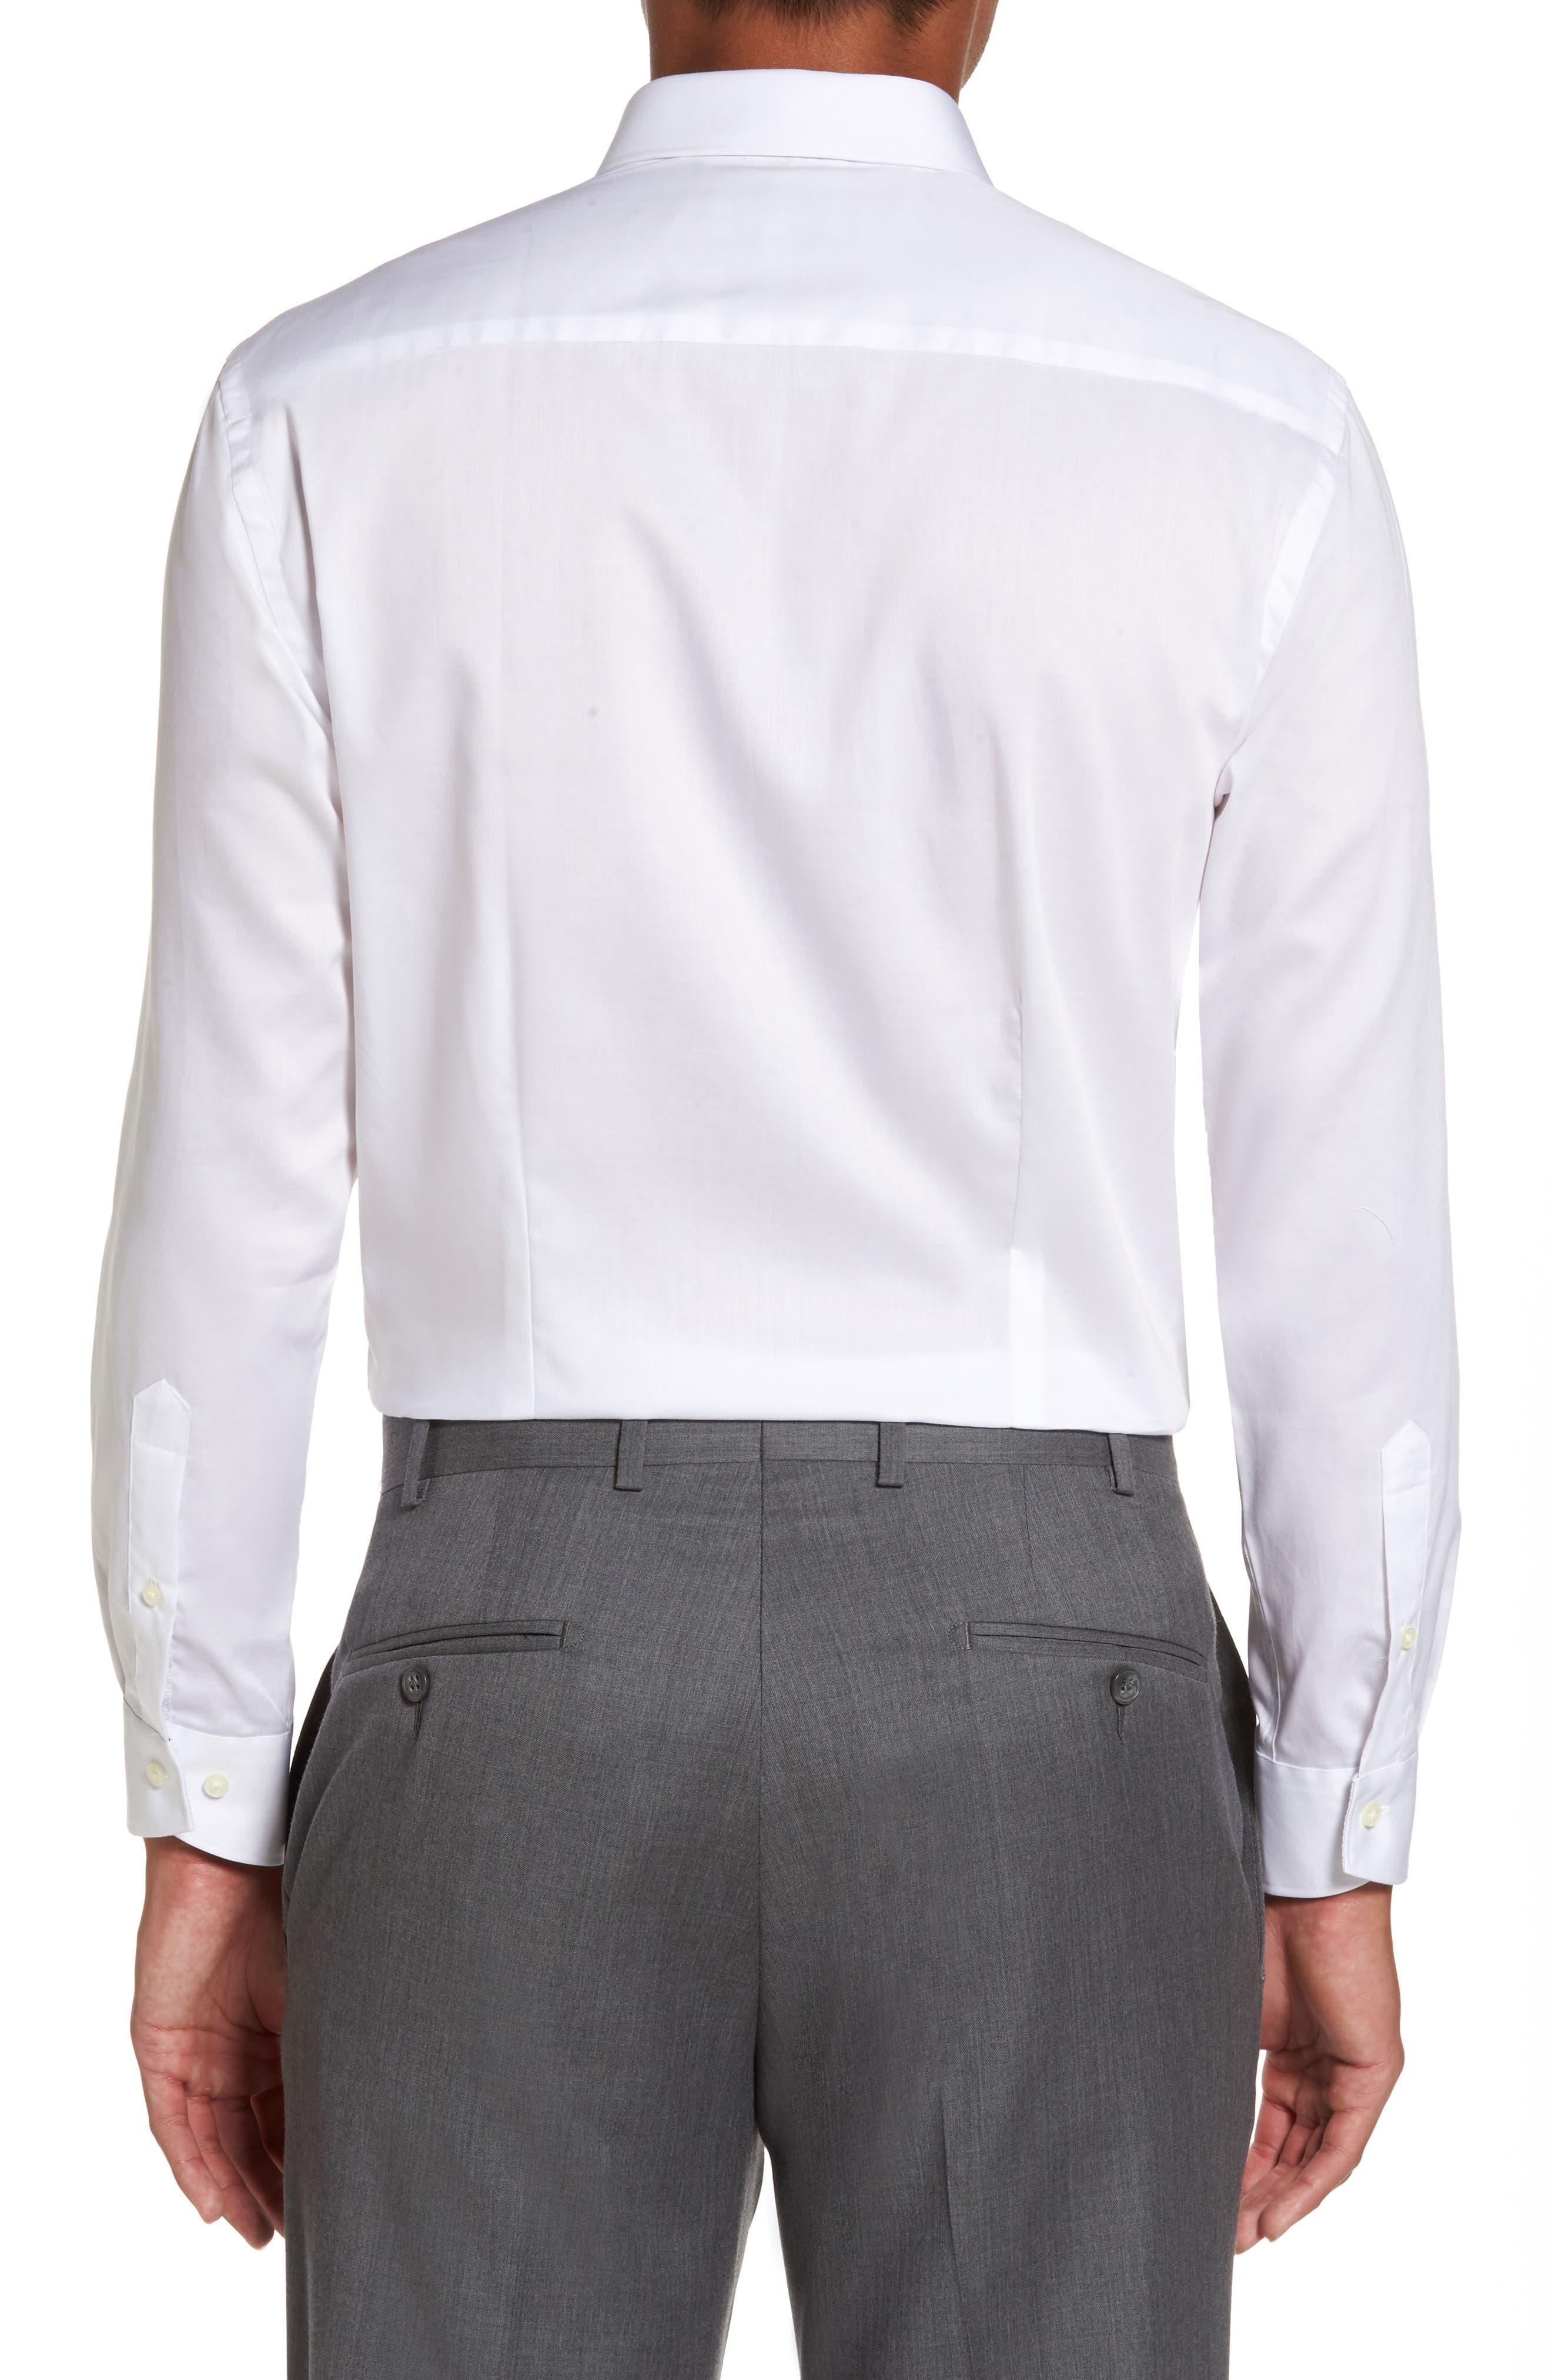 Caramor Trim Fit Solid Dress Shirt,                             Alternate thumbnail 2, color,                             White